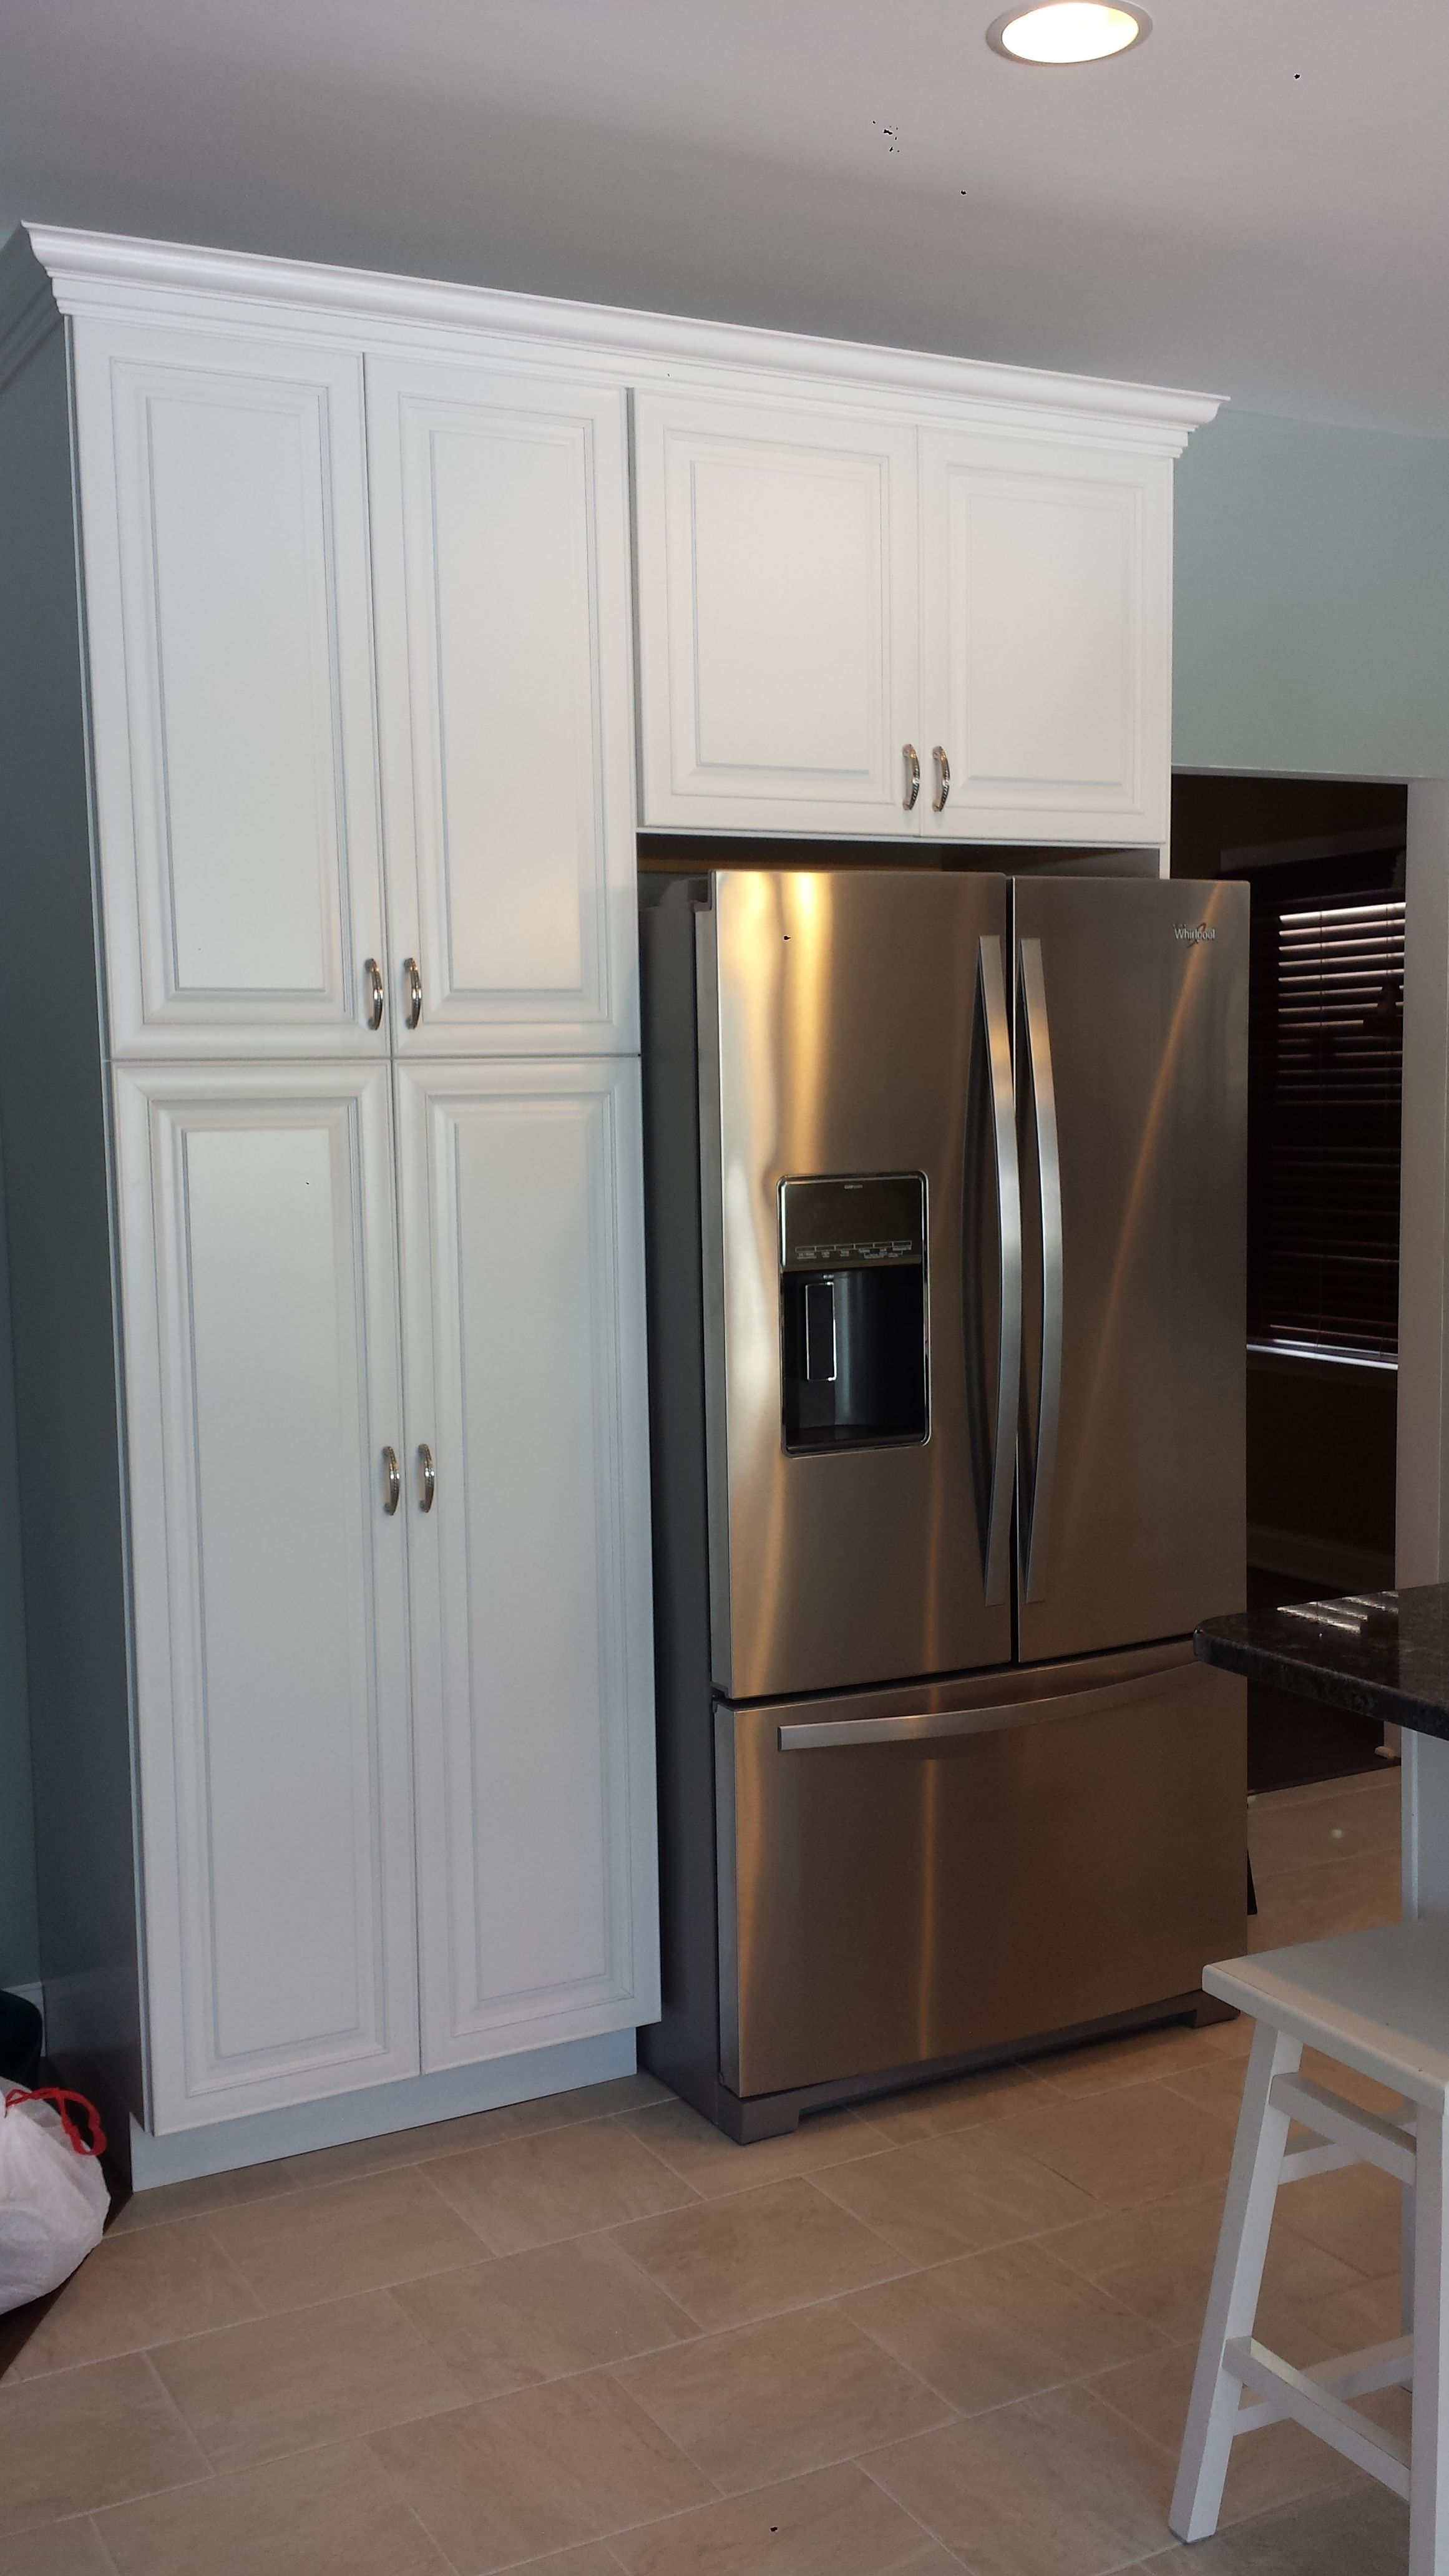 Streater Kitchen Designed By Thomas Matteo #kitchen #kraftmaid #cabinets  #refrigerator #pantry